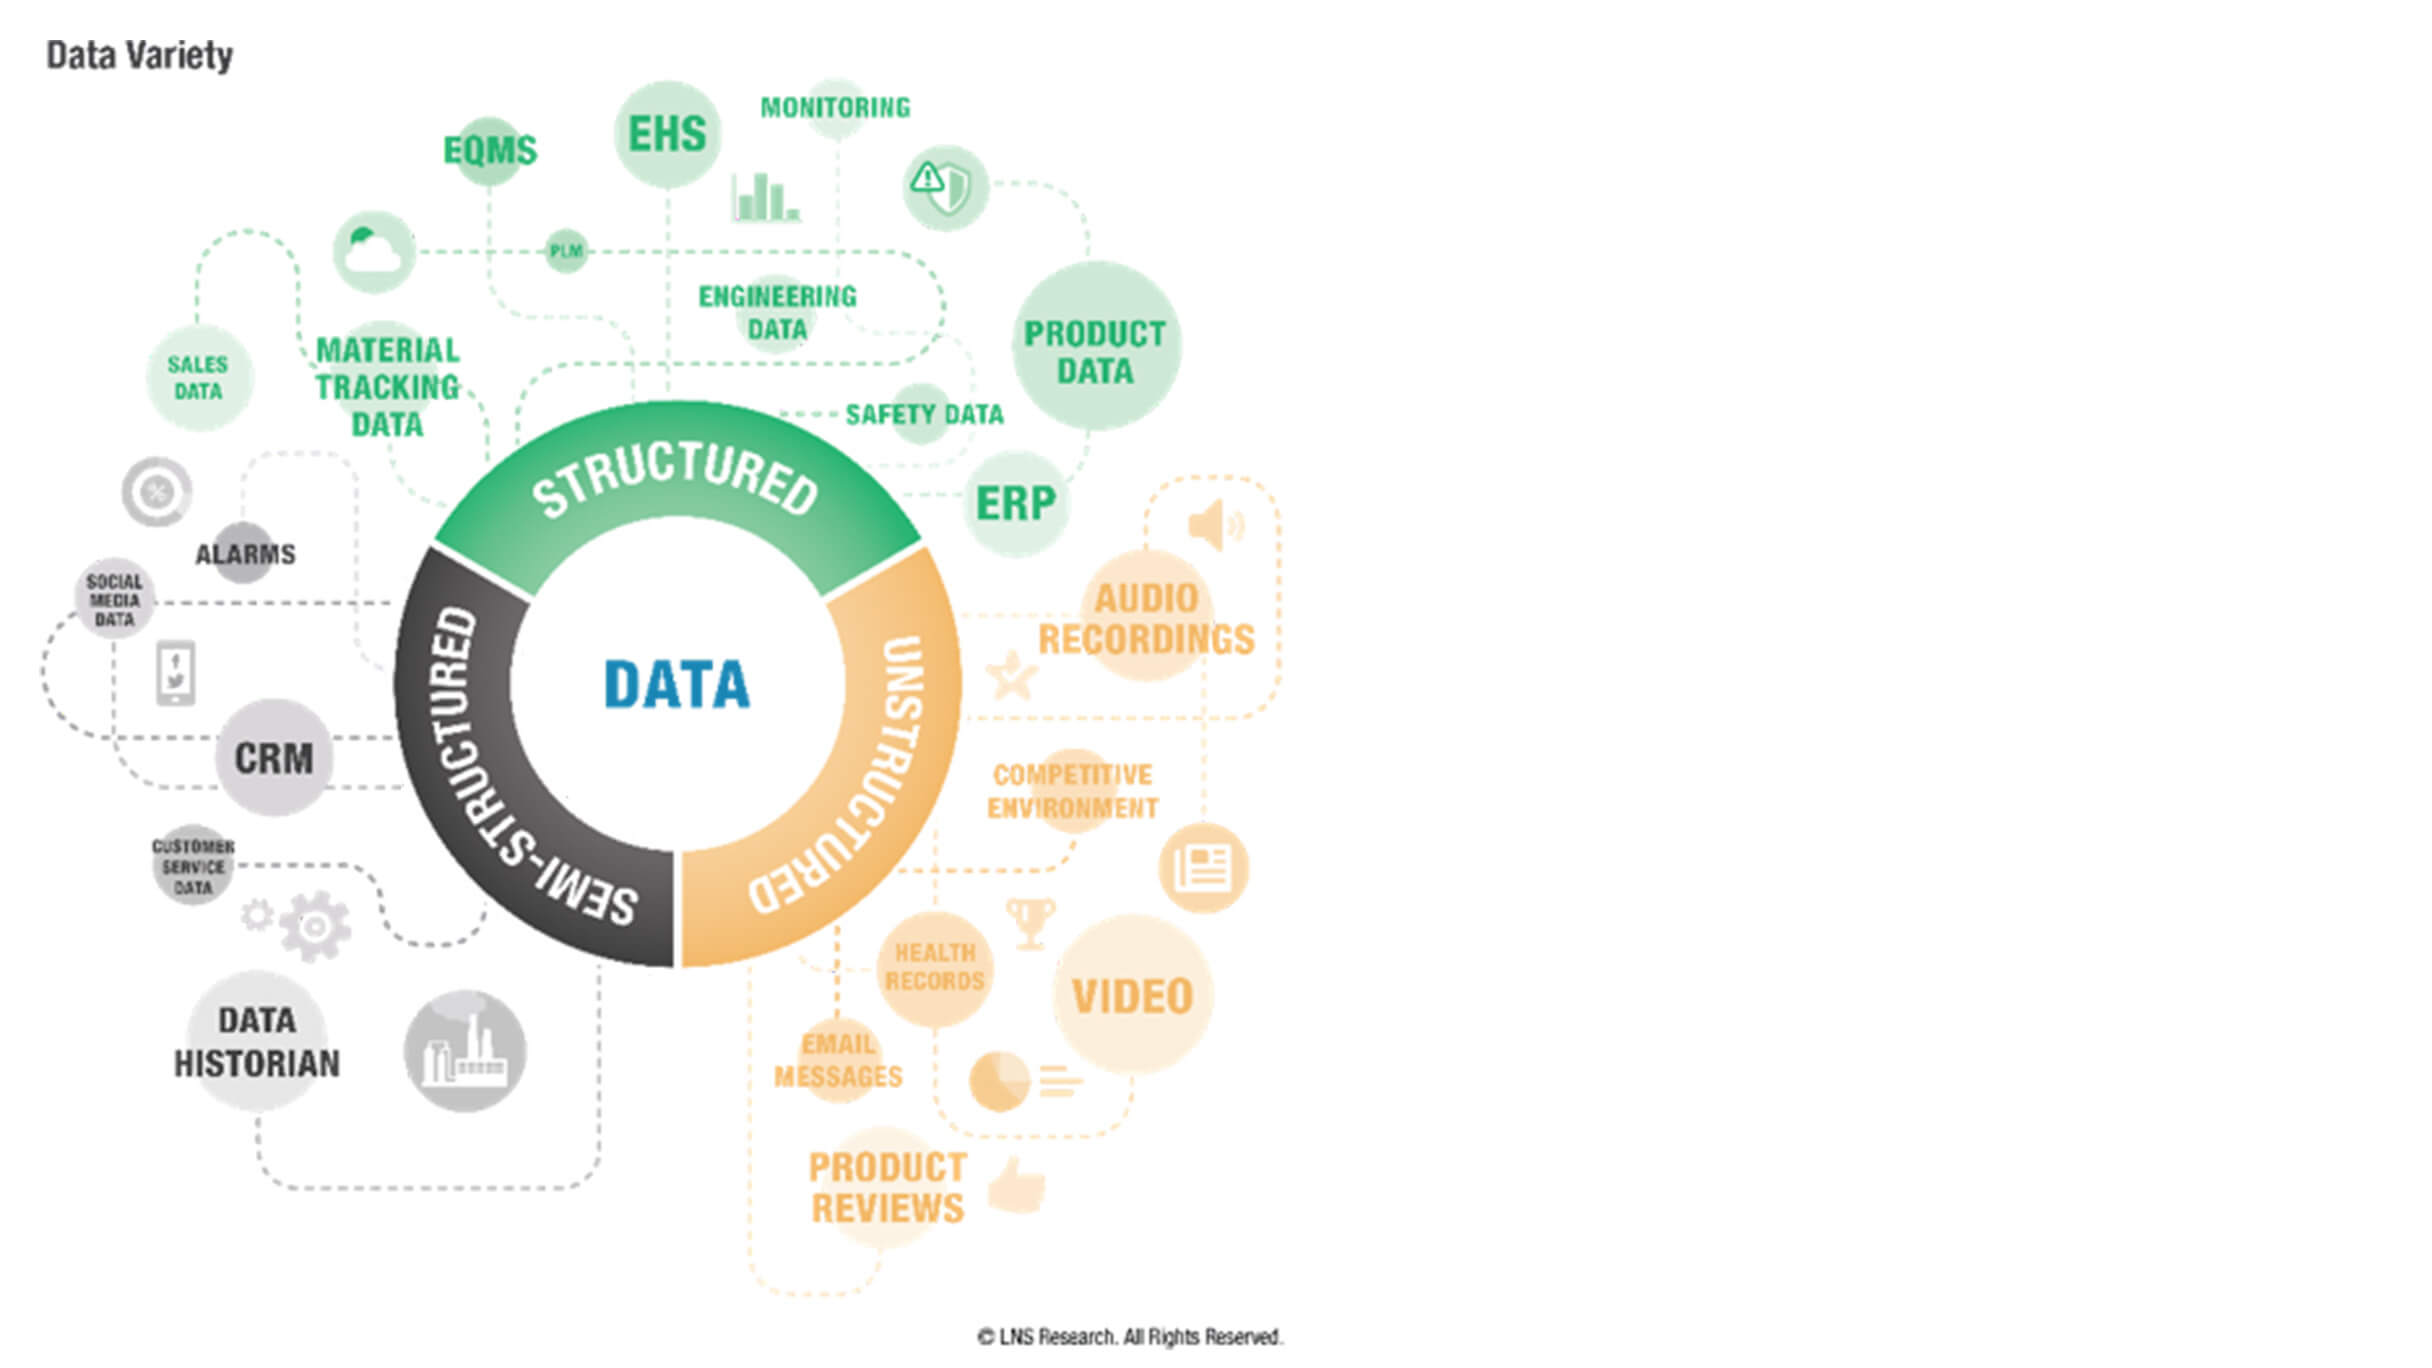 LNS Research   Data variety diagram   GE Digital blog